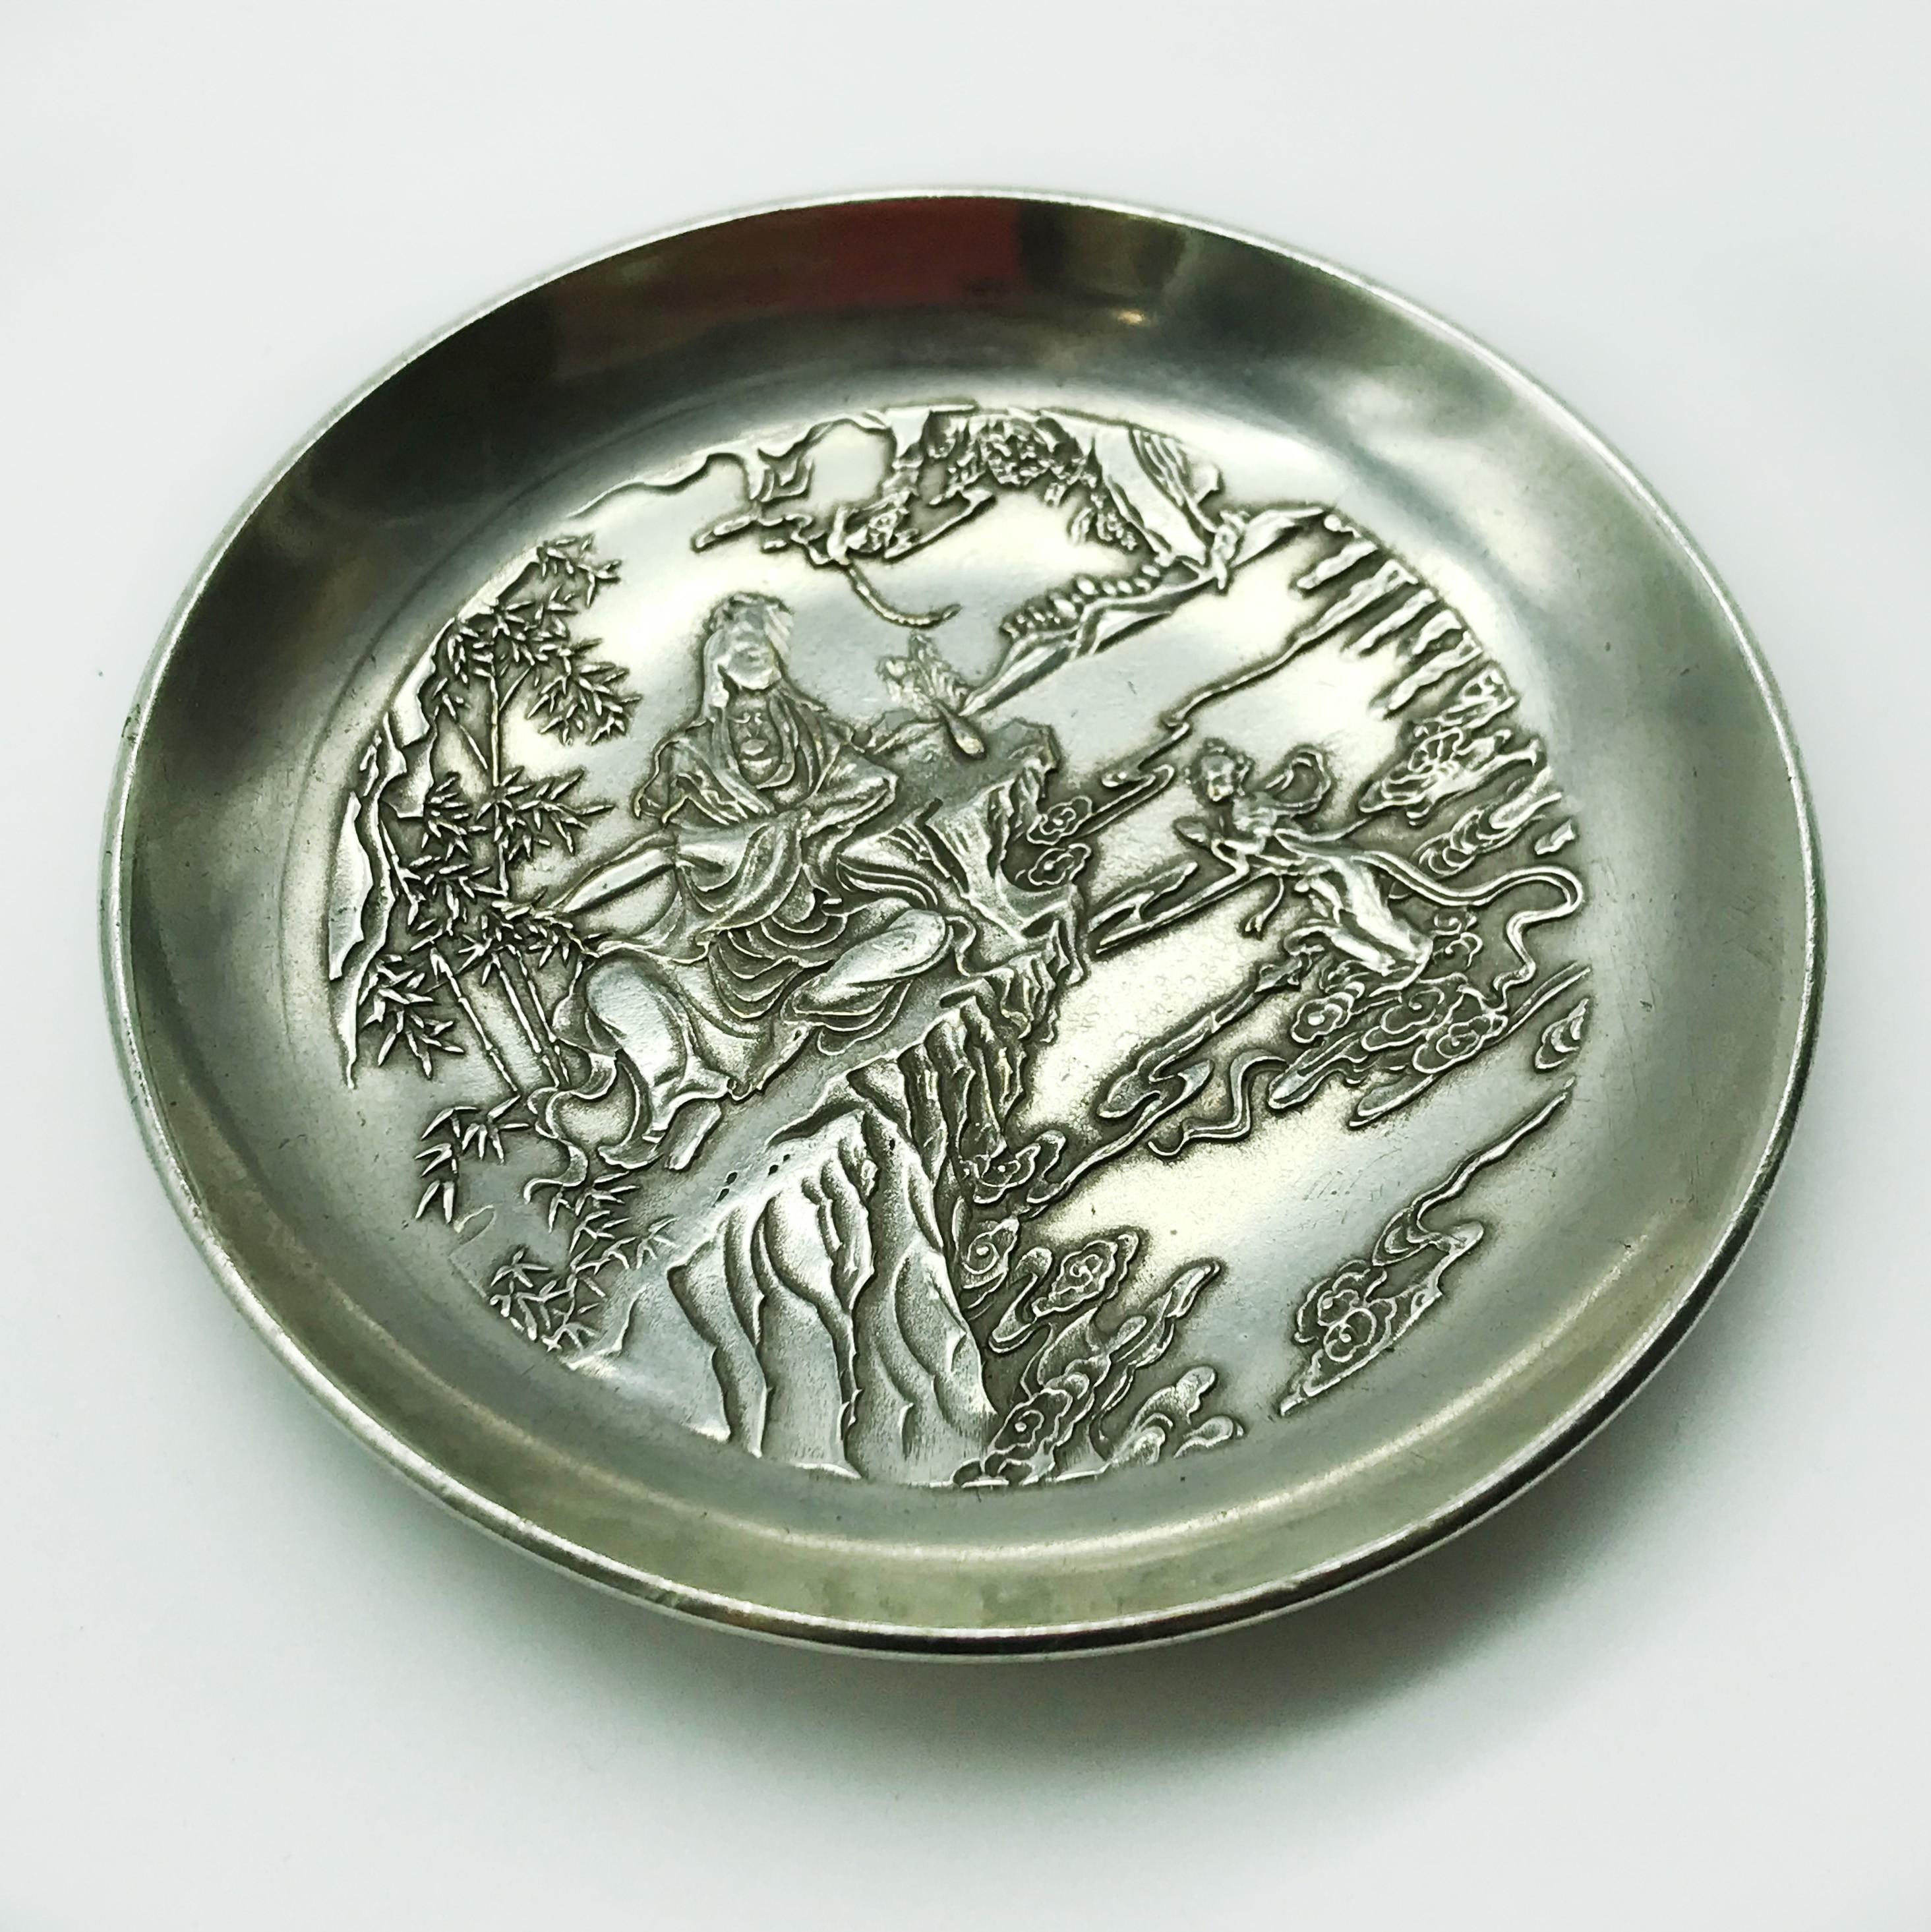 Lot 39 - JAPANESE SOUVENIR COIN DISH